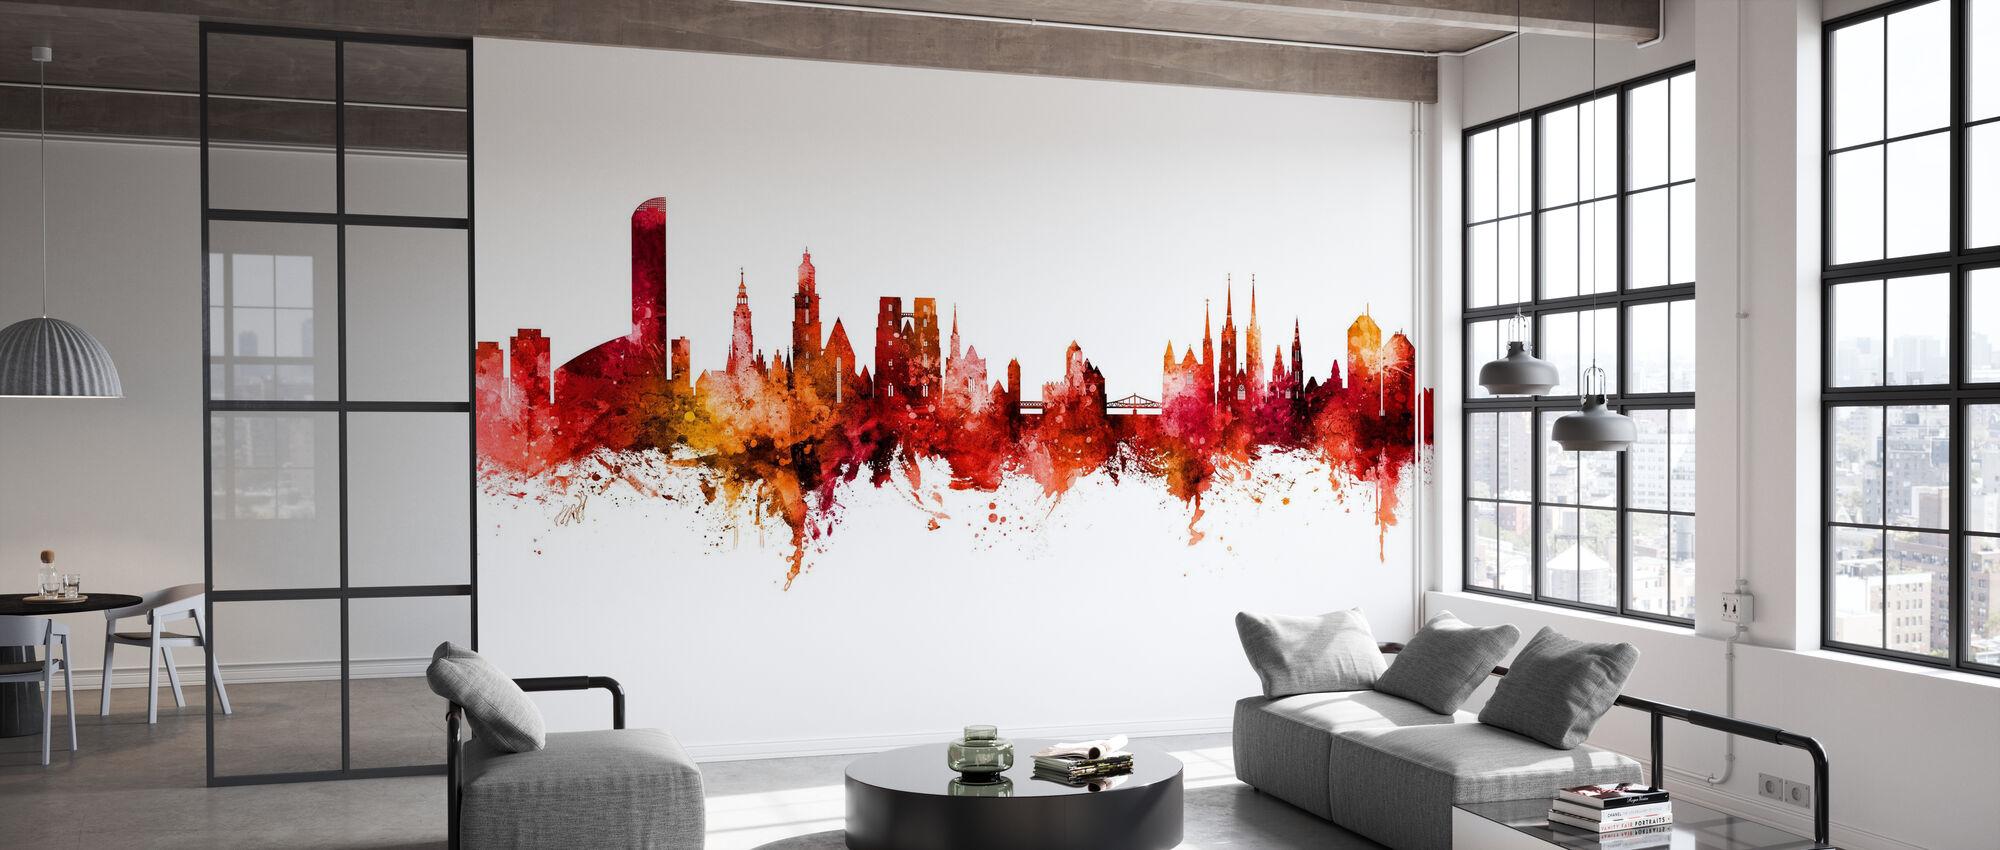 Wroclaw Poland Skyline - Wallpaper - Office